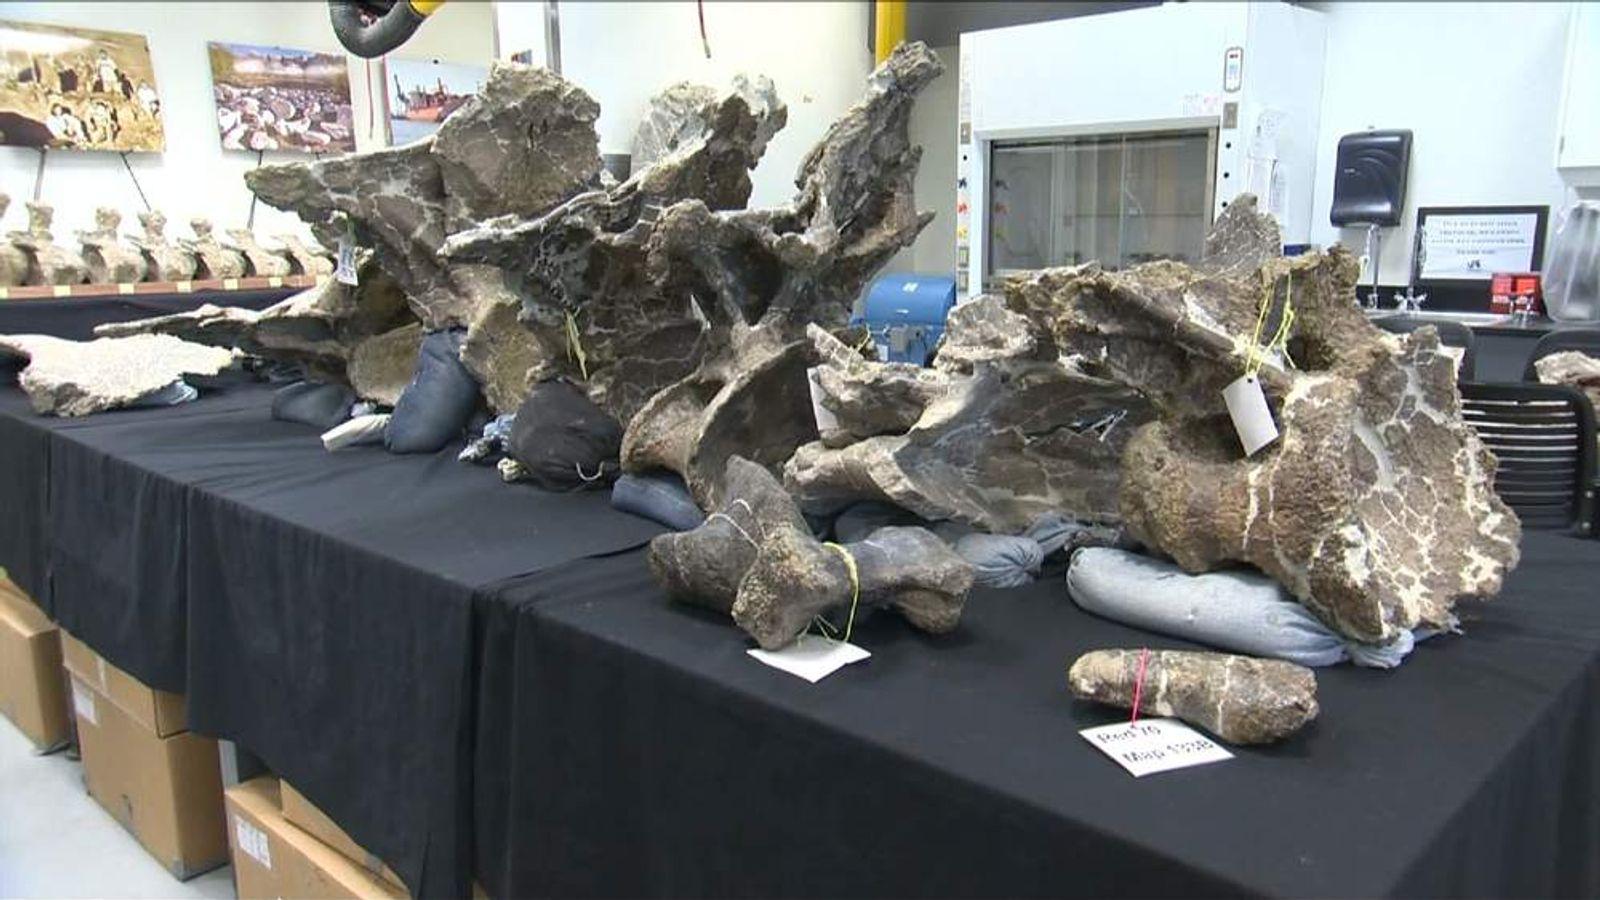 Bones of giant Dreadnoughtus dinosaur found in Argentina